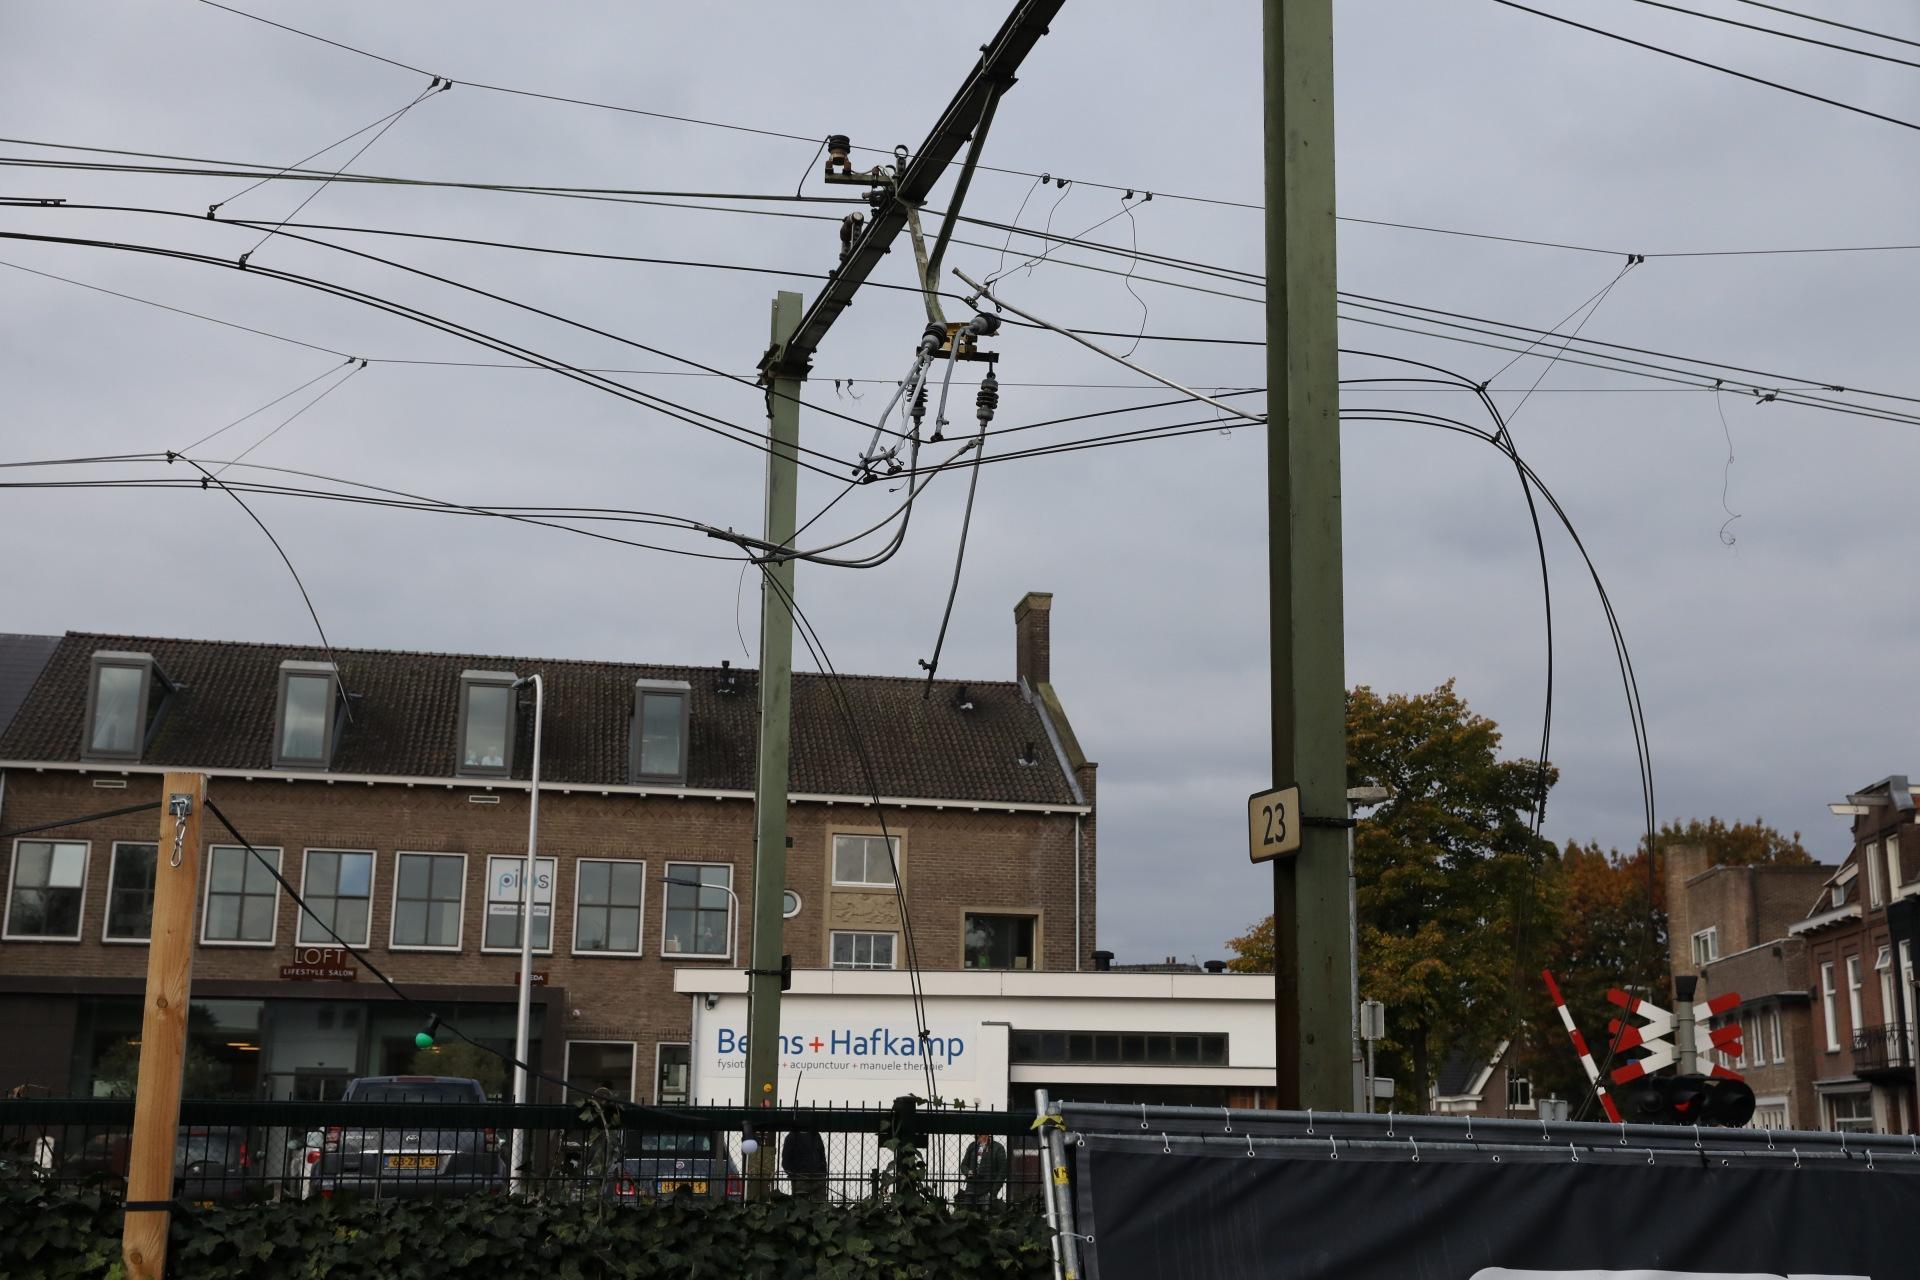 Treinverkeer rond Naarden-Bussum nog steeds stil. 'Treinen zullen om half elf weer rijden'